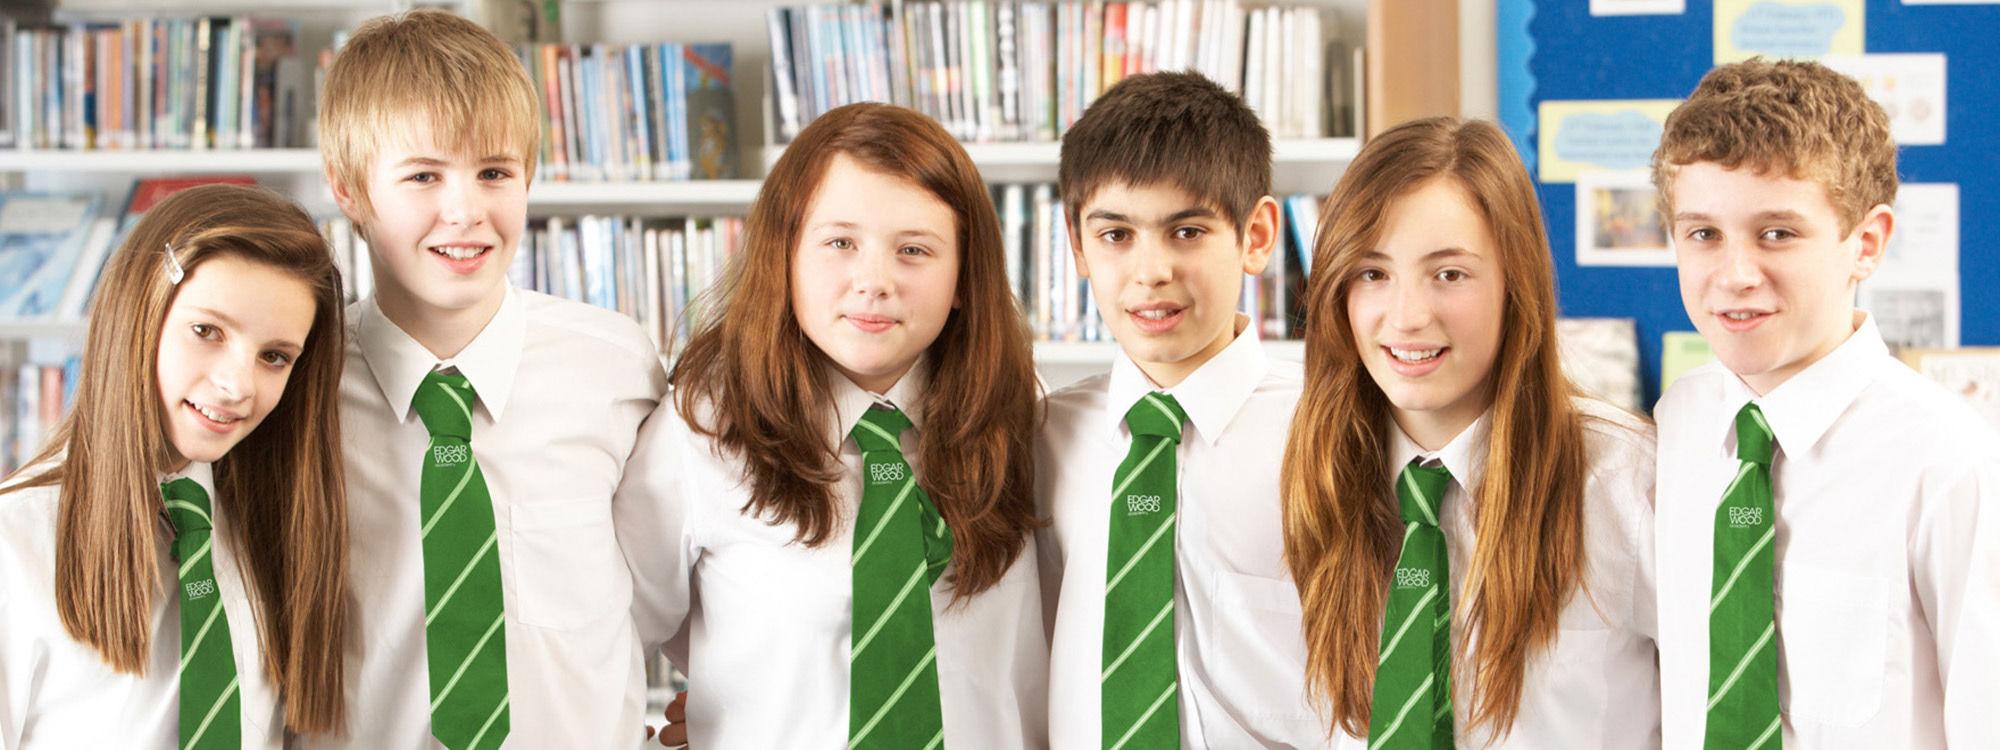 Students header